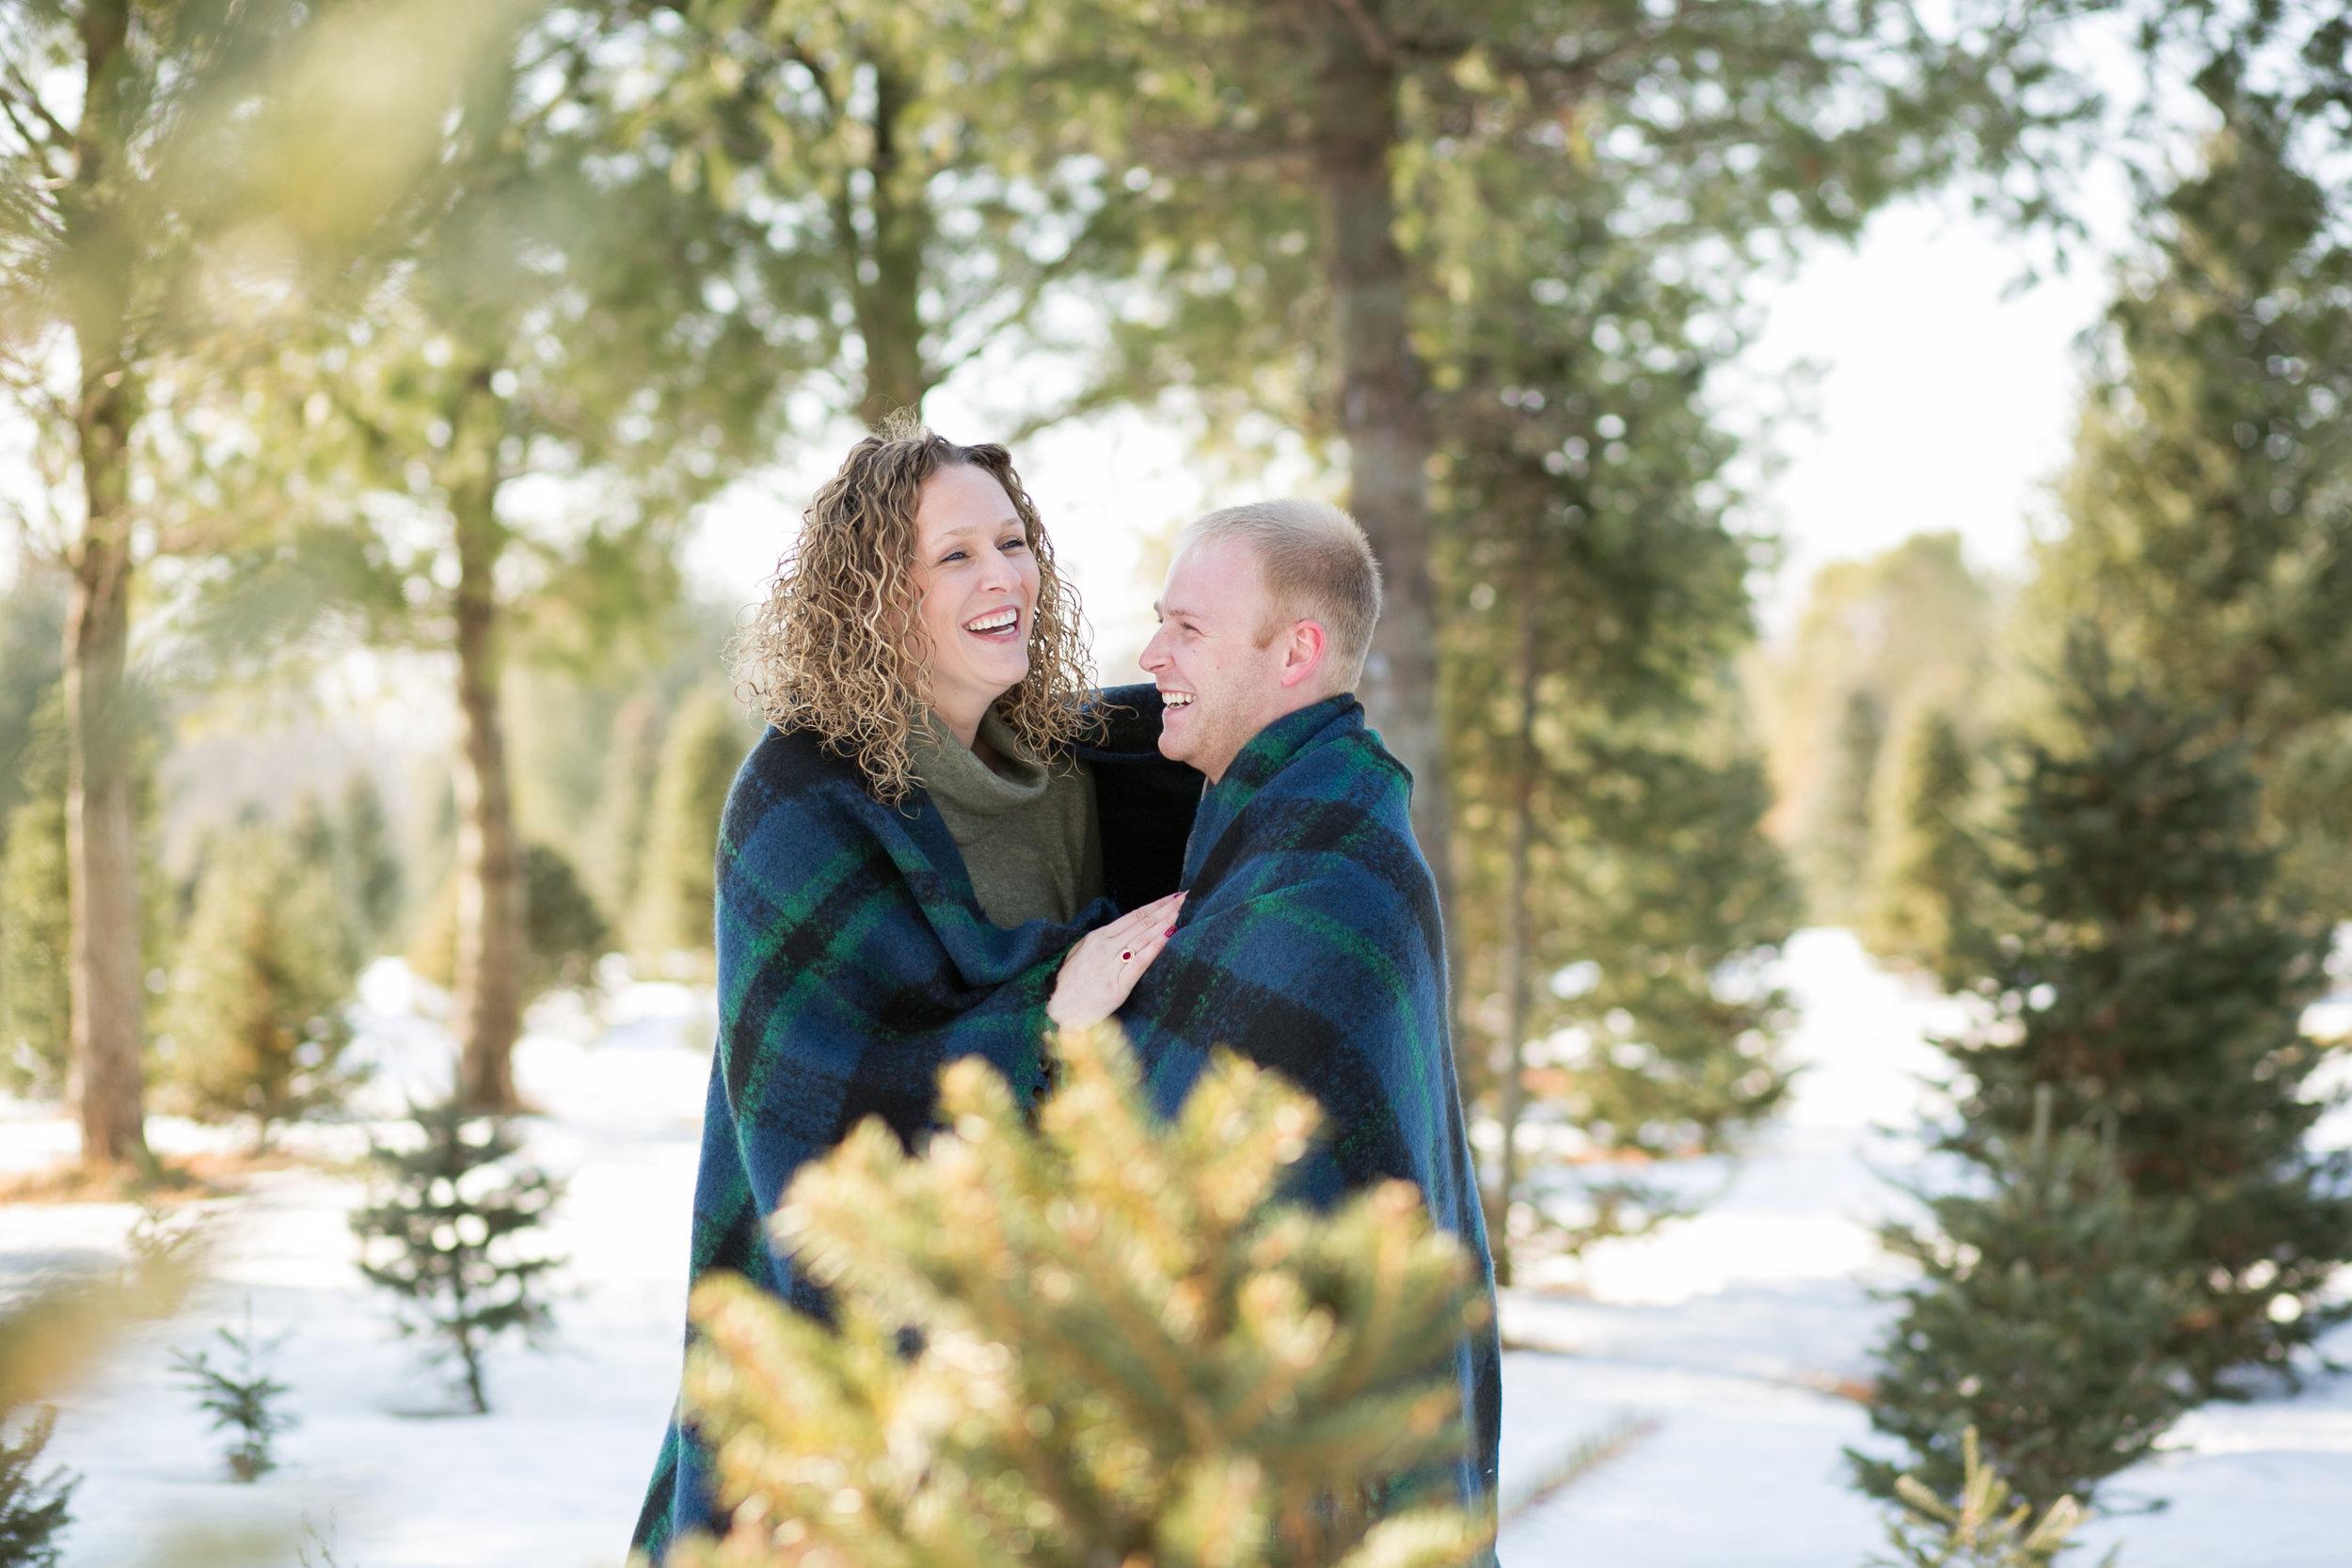 Minnesota Winter Engagement Photo by Minneapolis Wedding Photographer Chelsea Bolling